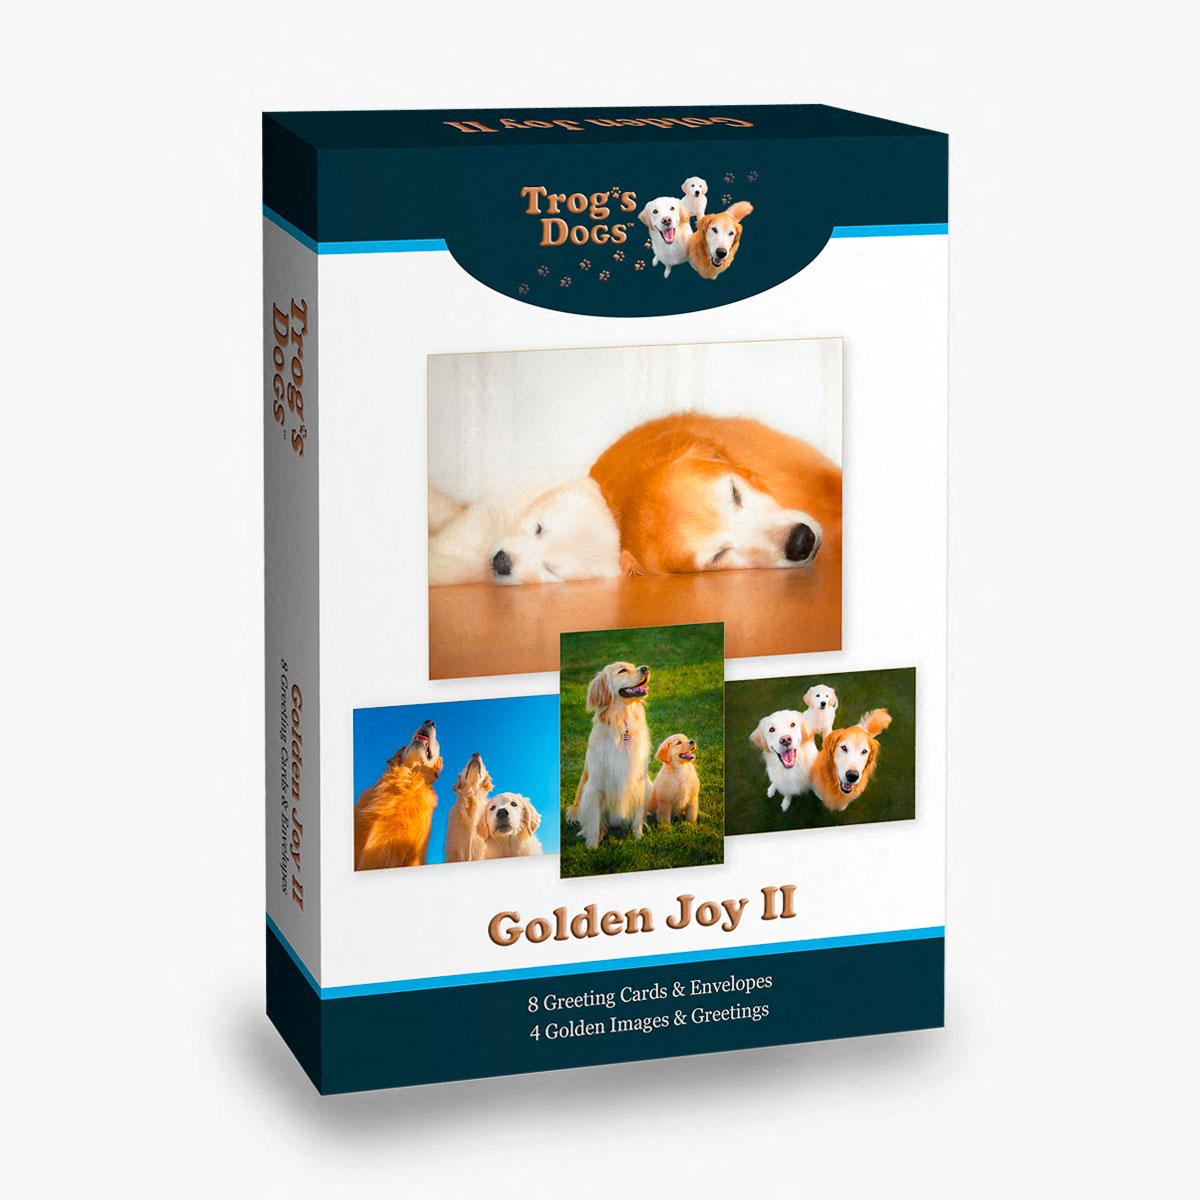 Trog's Dogs Golden Joy II Greeting Cards